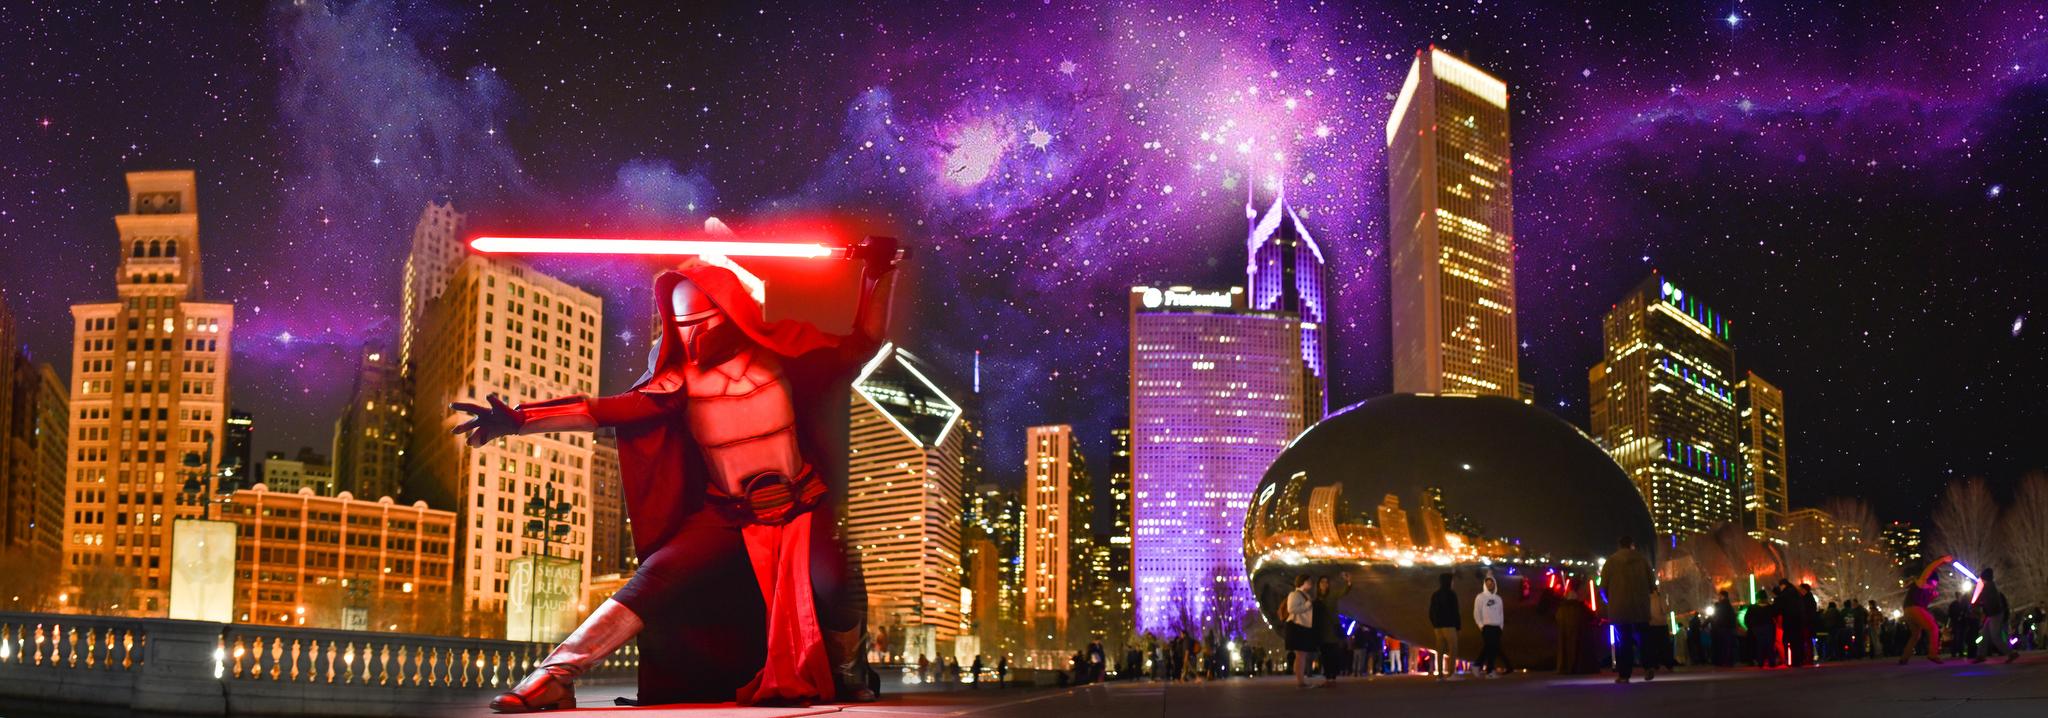 2019.04.14 - Star Wars Celebration Chicago 288836.JPG